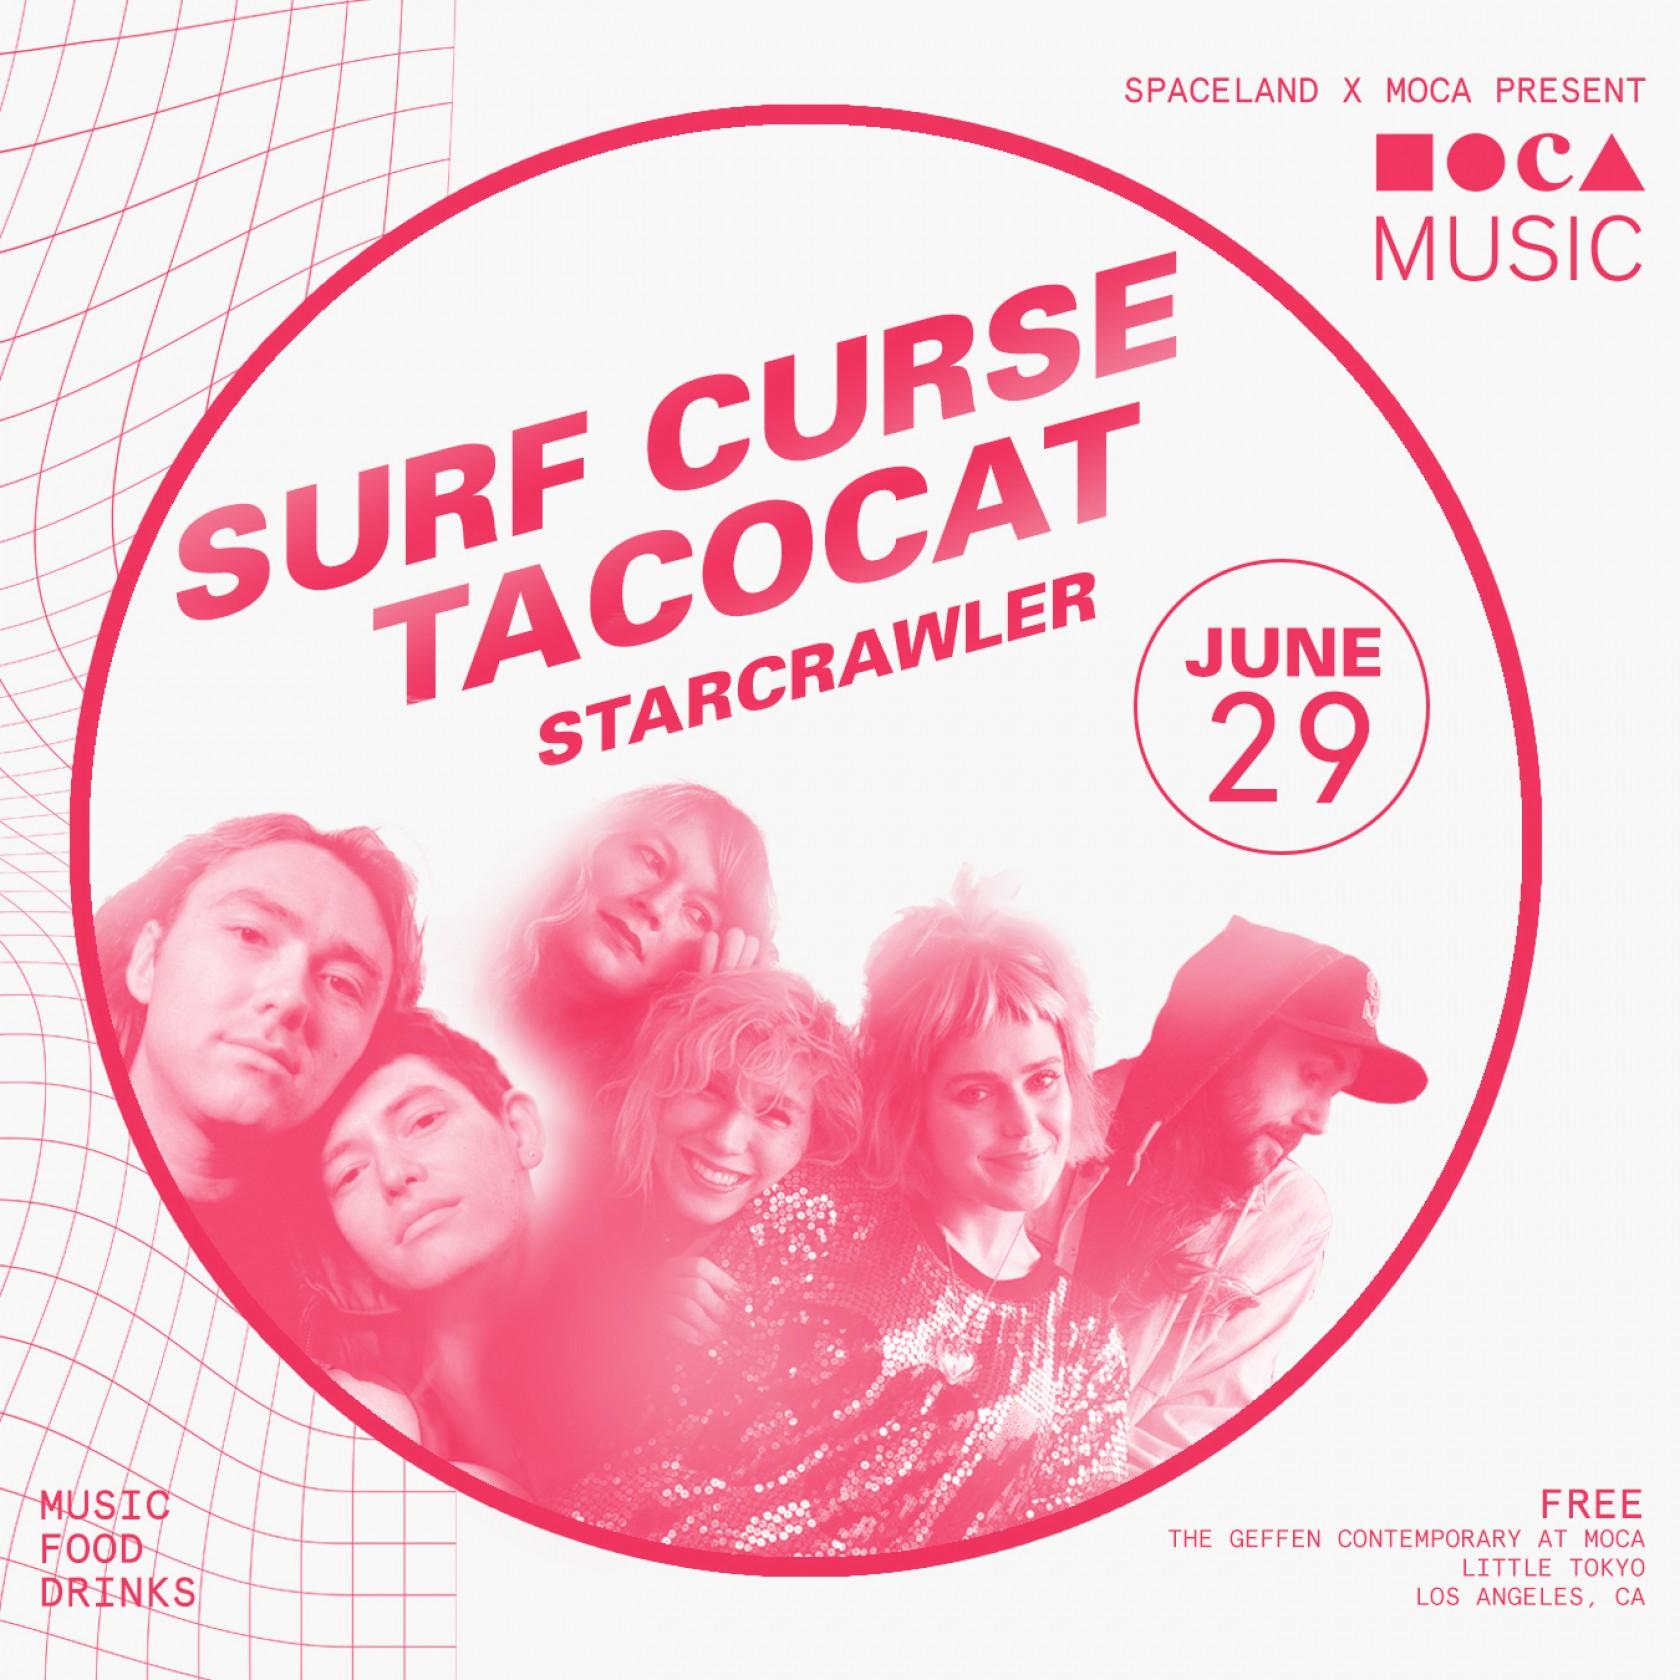 MOCA Music: Surf Curse, Tacocat, Starcrawler